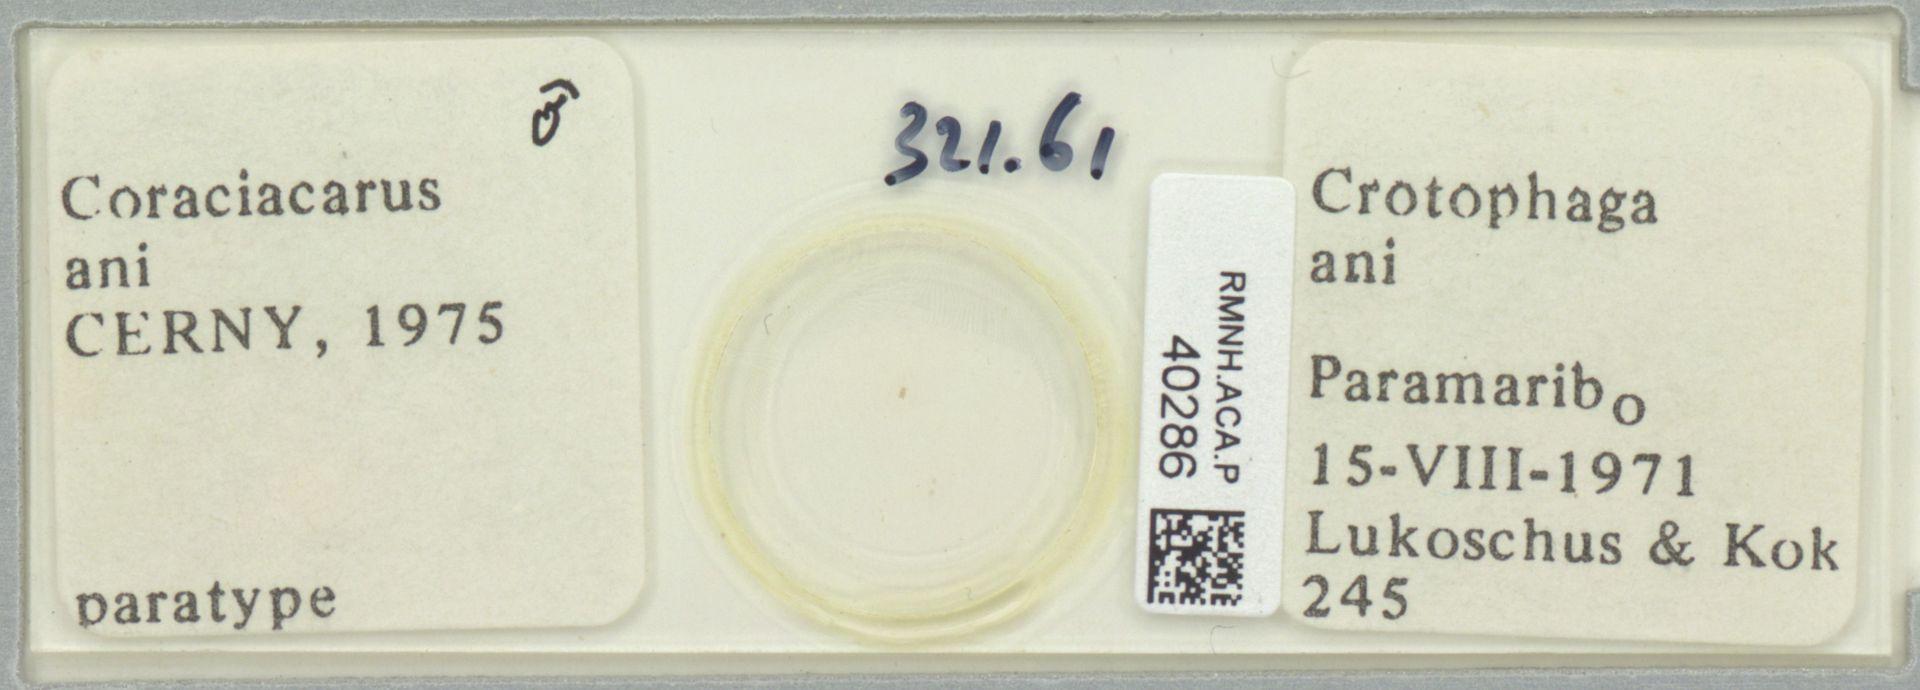 RMNH.ACA.P.40286   Coraciacarus ani Cerny, 1975